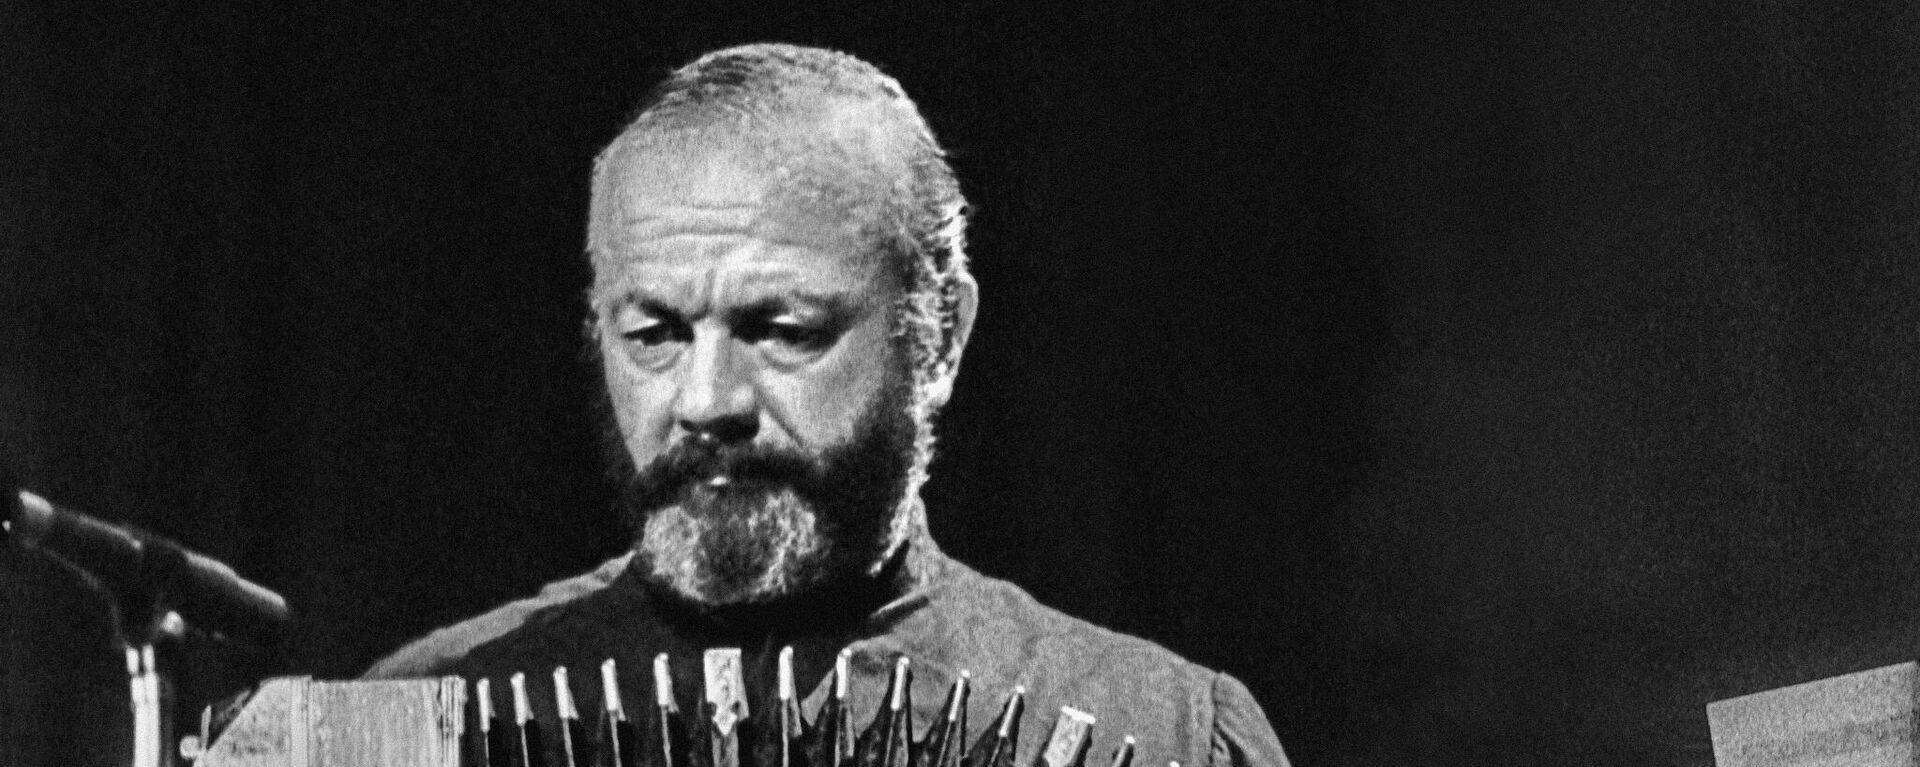 Ástor Piazzolla en 1971 - Sputnik Mundo, 1920, 11.03.2021